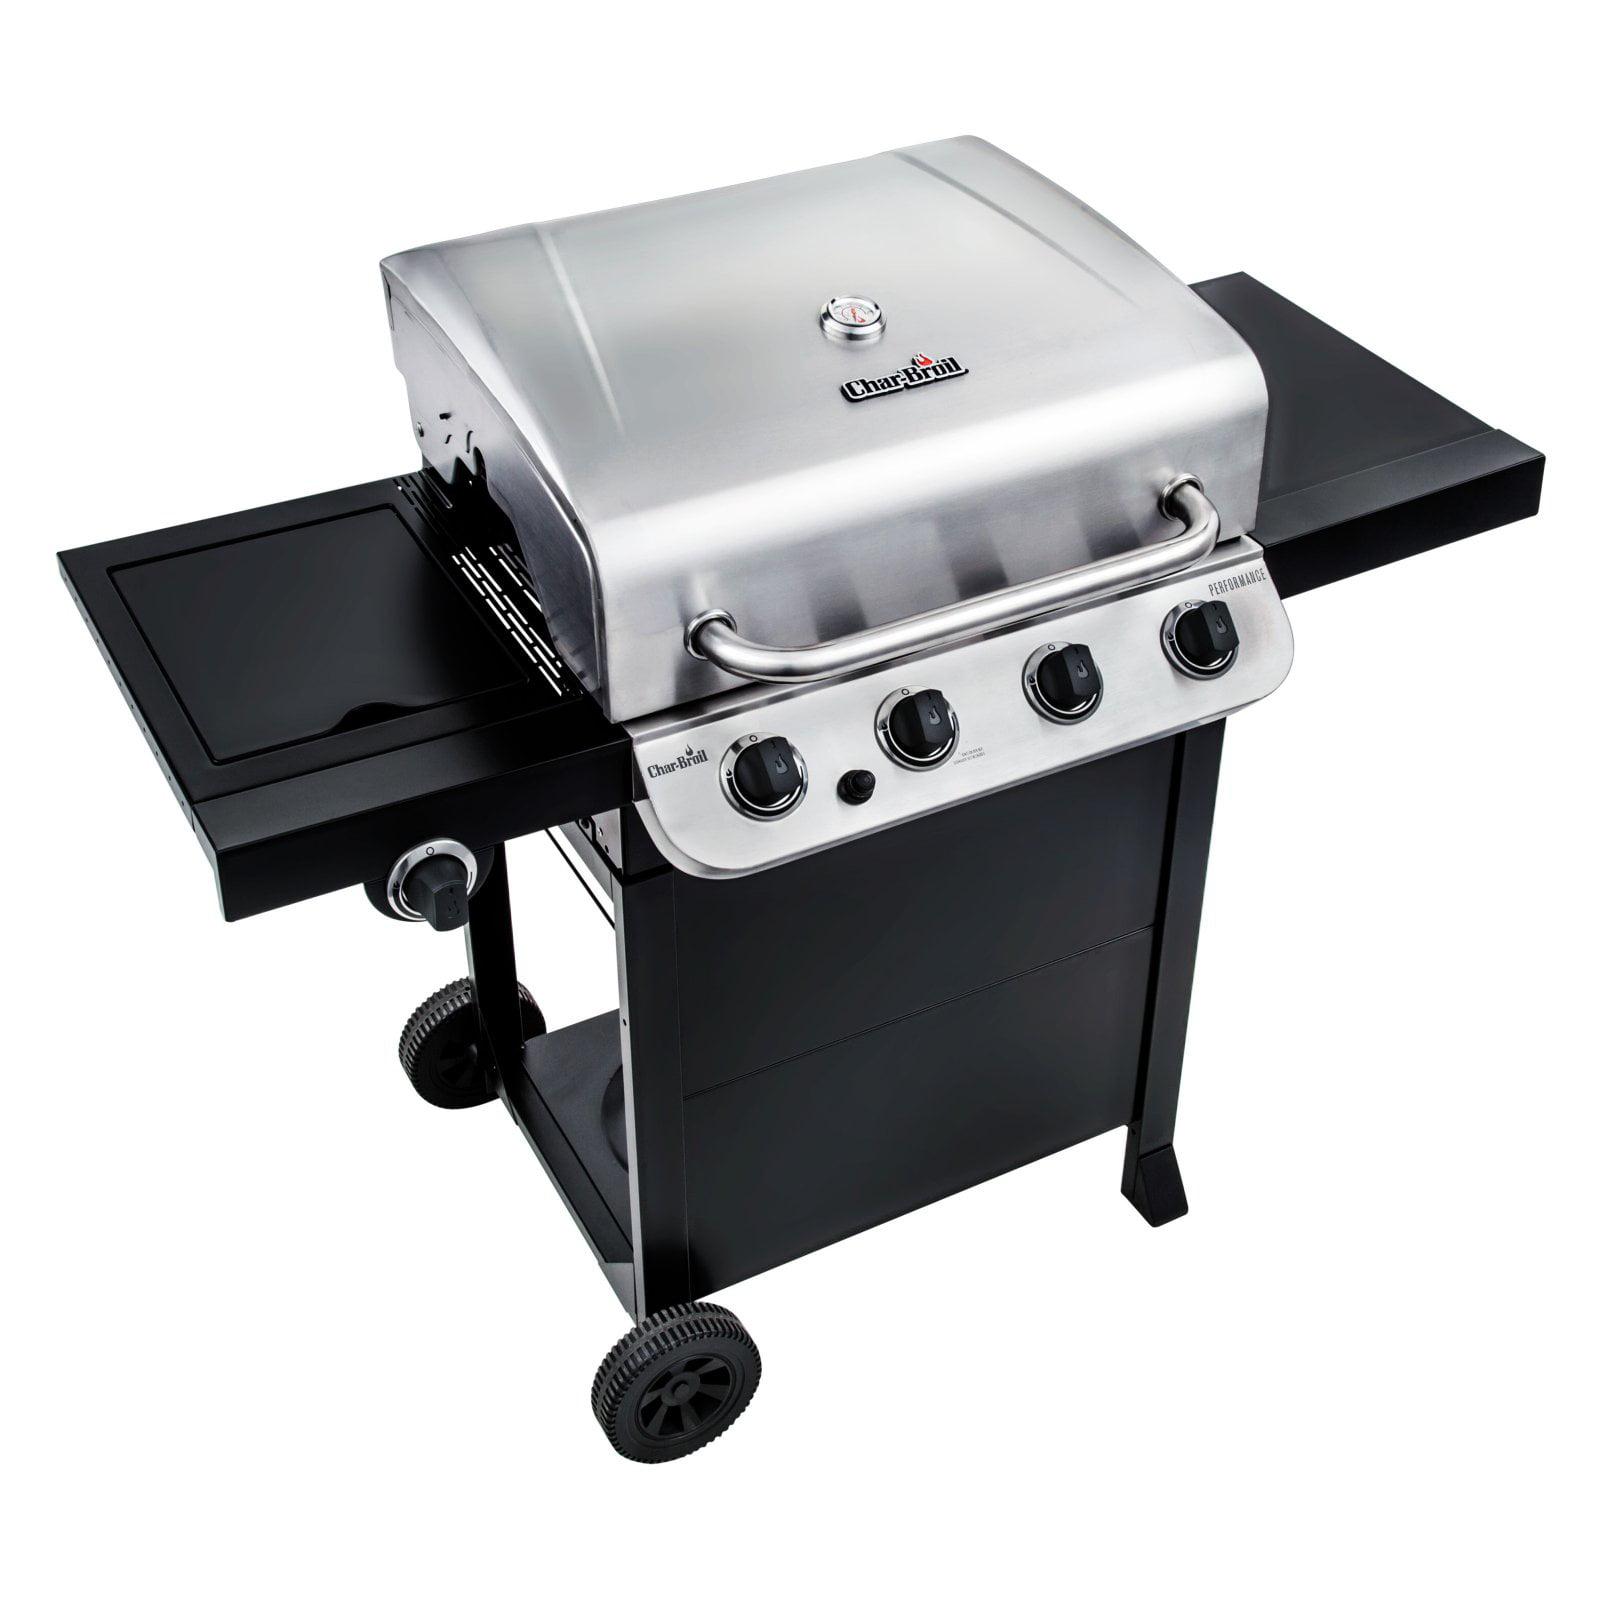 Char-Broil Performance 4-Burner Gas Grill 47362337603 | eBay